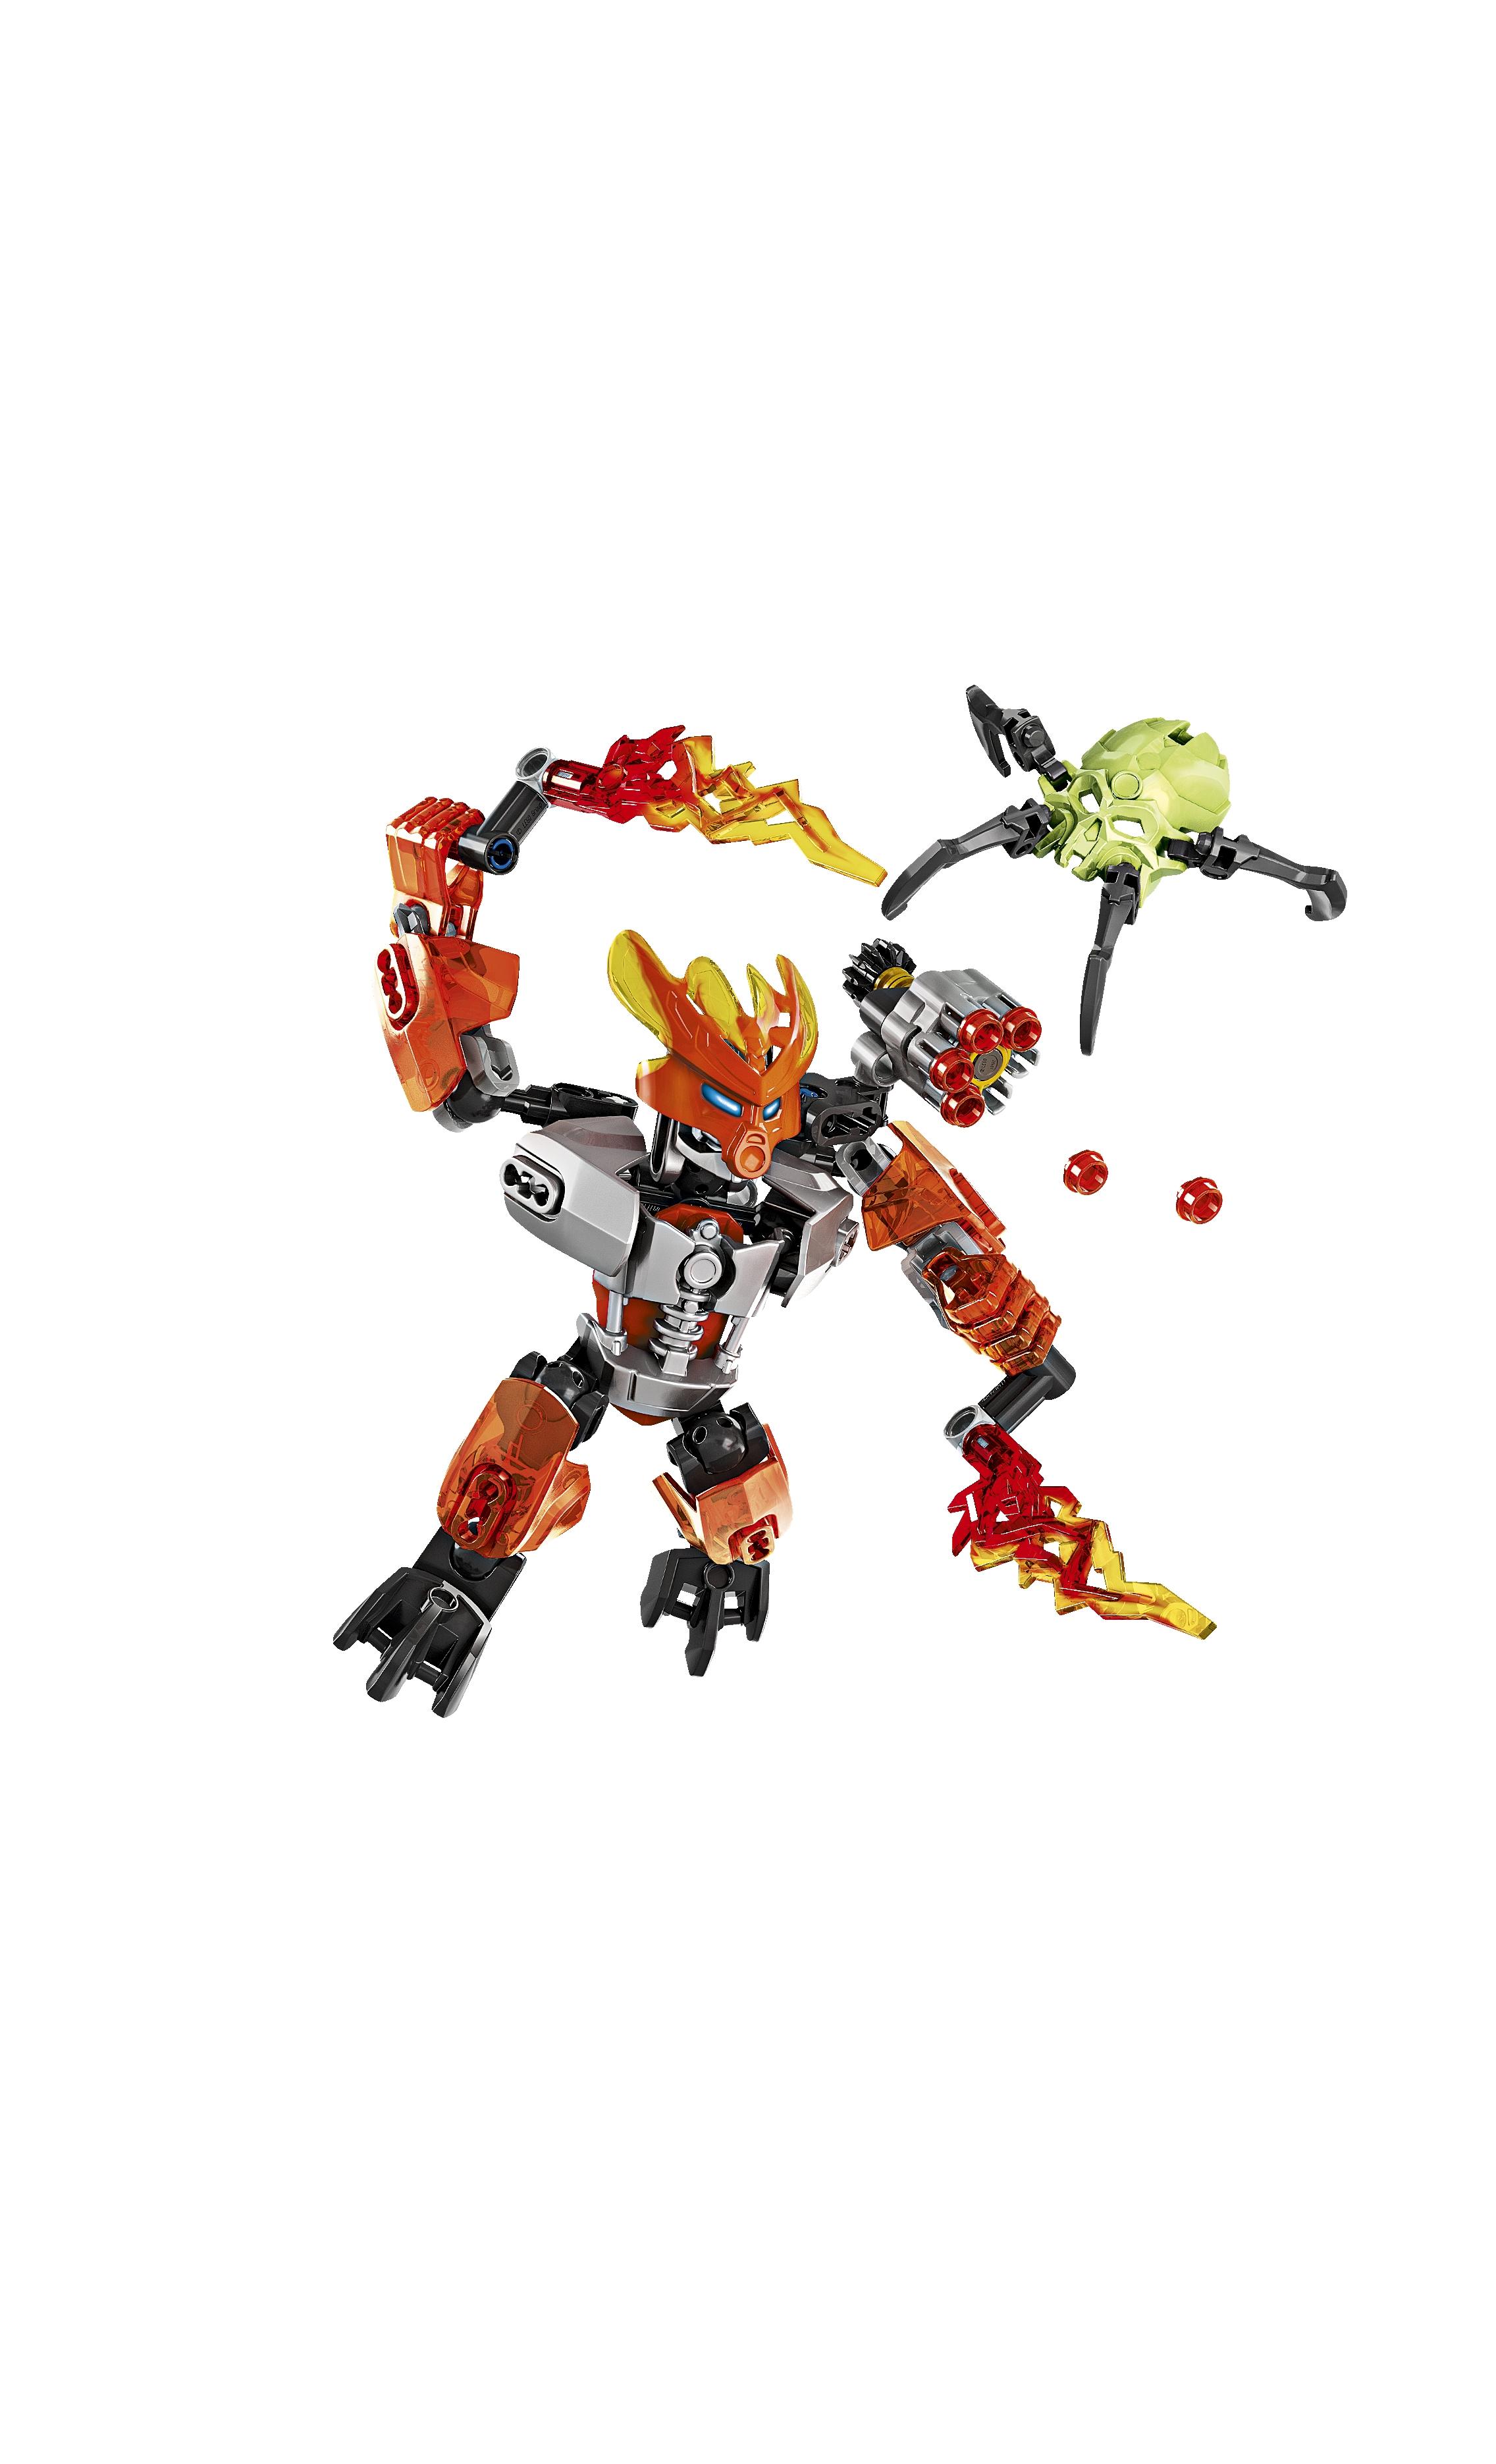 Lego's Bionicle line.